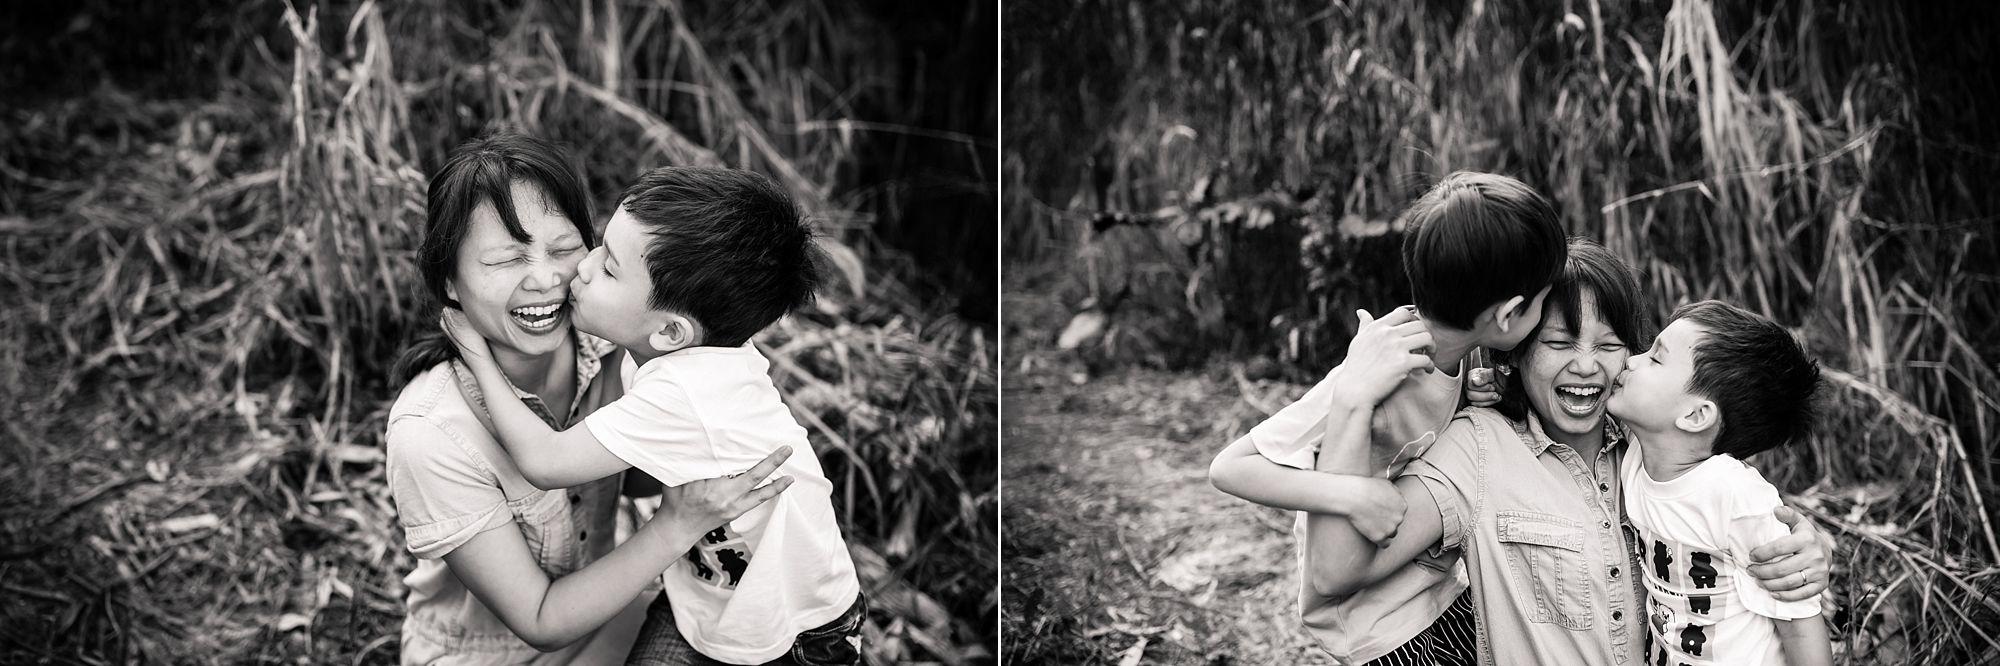 Taiwan_Family_Lifestyle_Photographer_Hunnicutt_Photography_0018